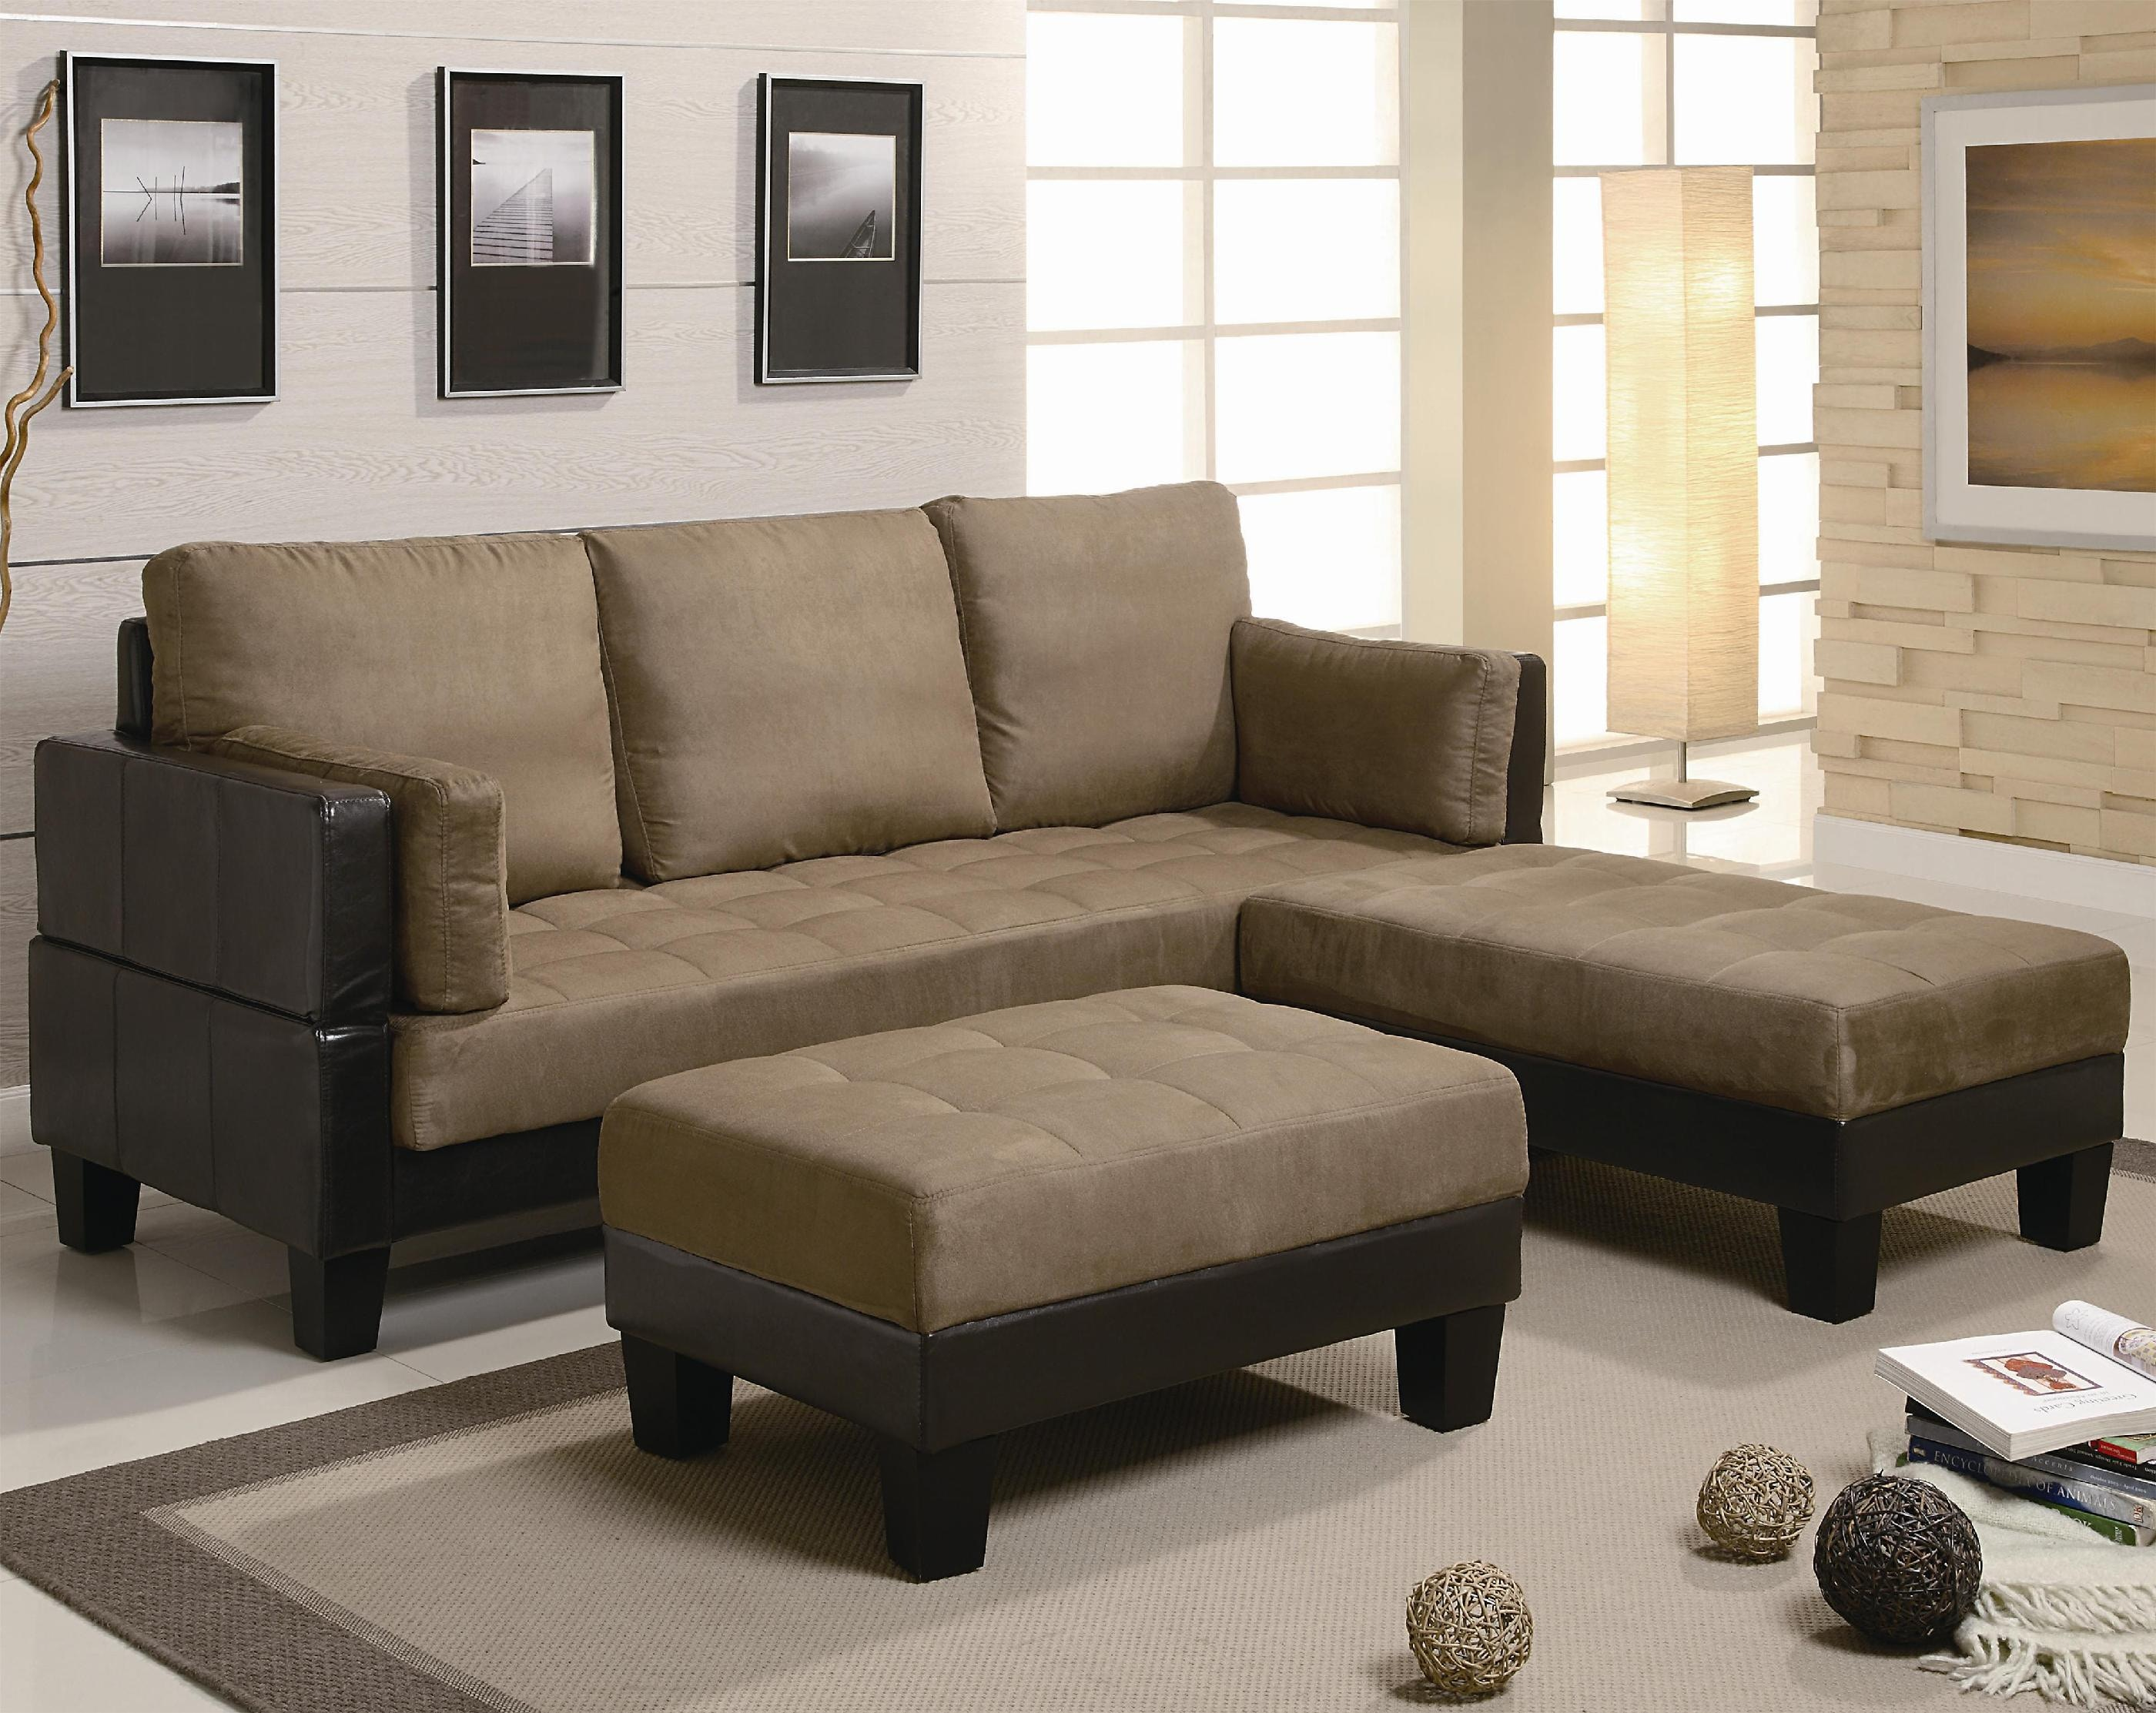 Dining Room Sets Atlanta Ga Coaster Living Room Sofa Bed 300160 The Furniture House